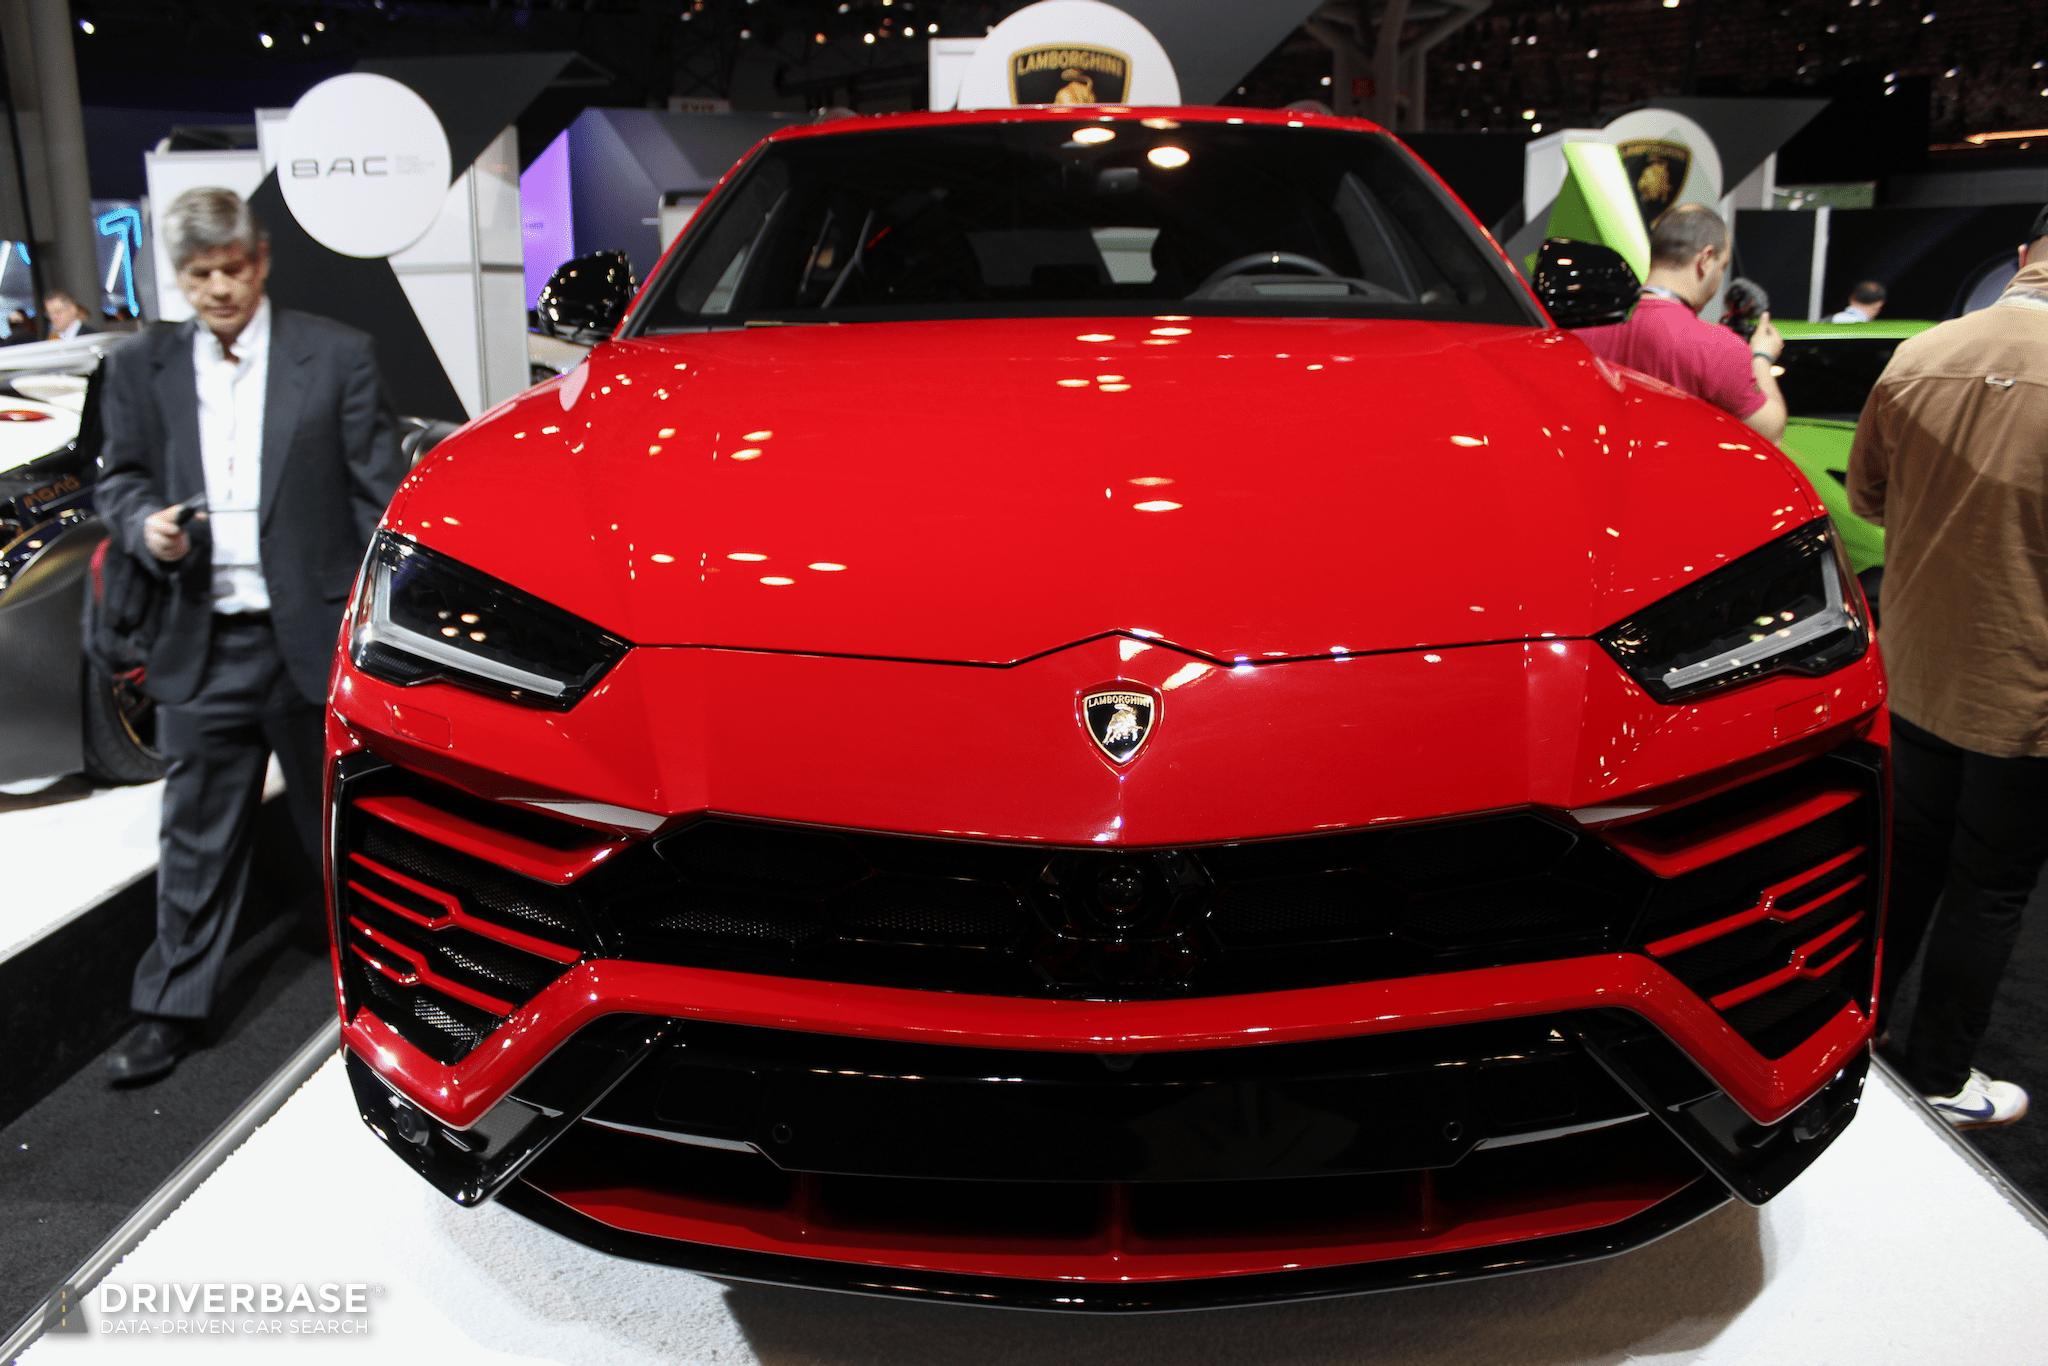 Used Cars Dealers >> Urus – Driverbase